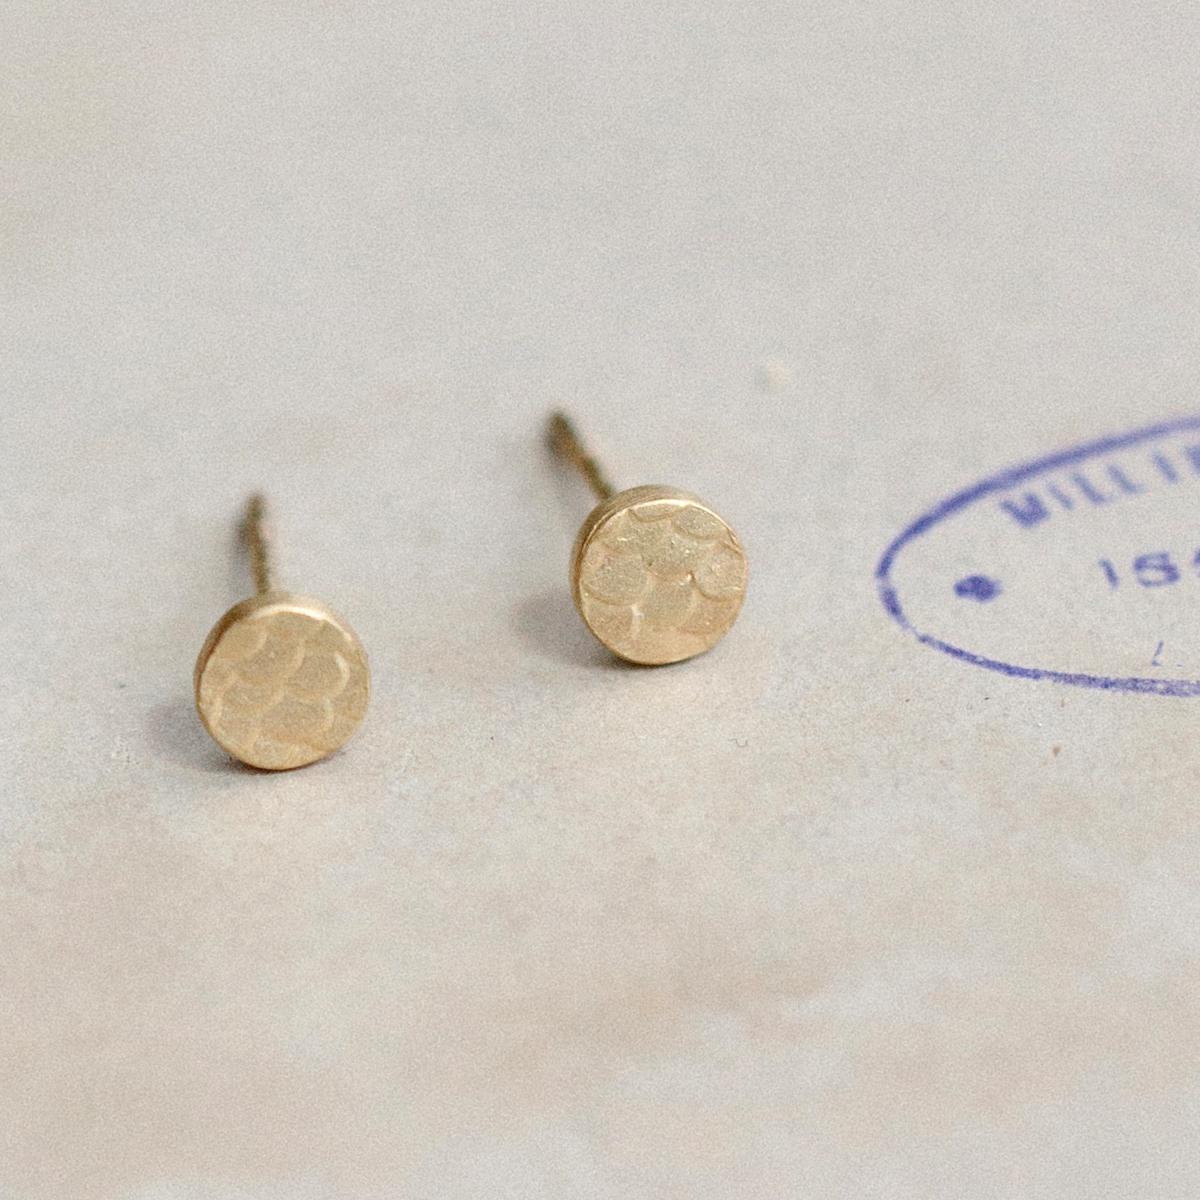 alison macleod 12 tiny catkin studs styled.jpg